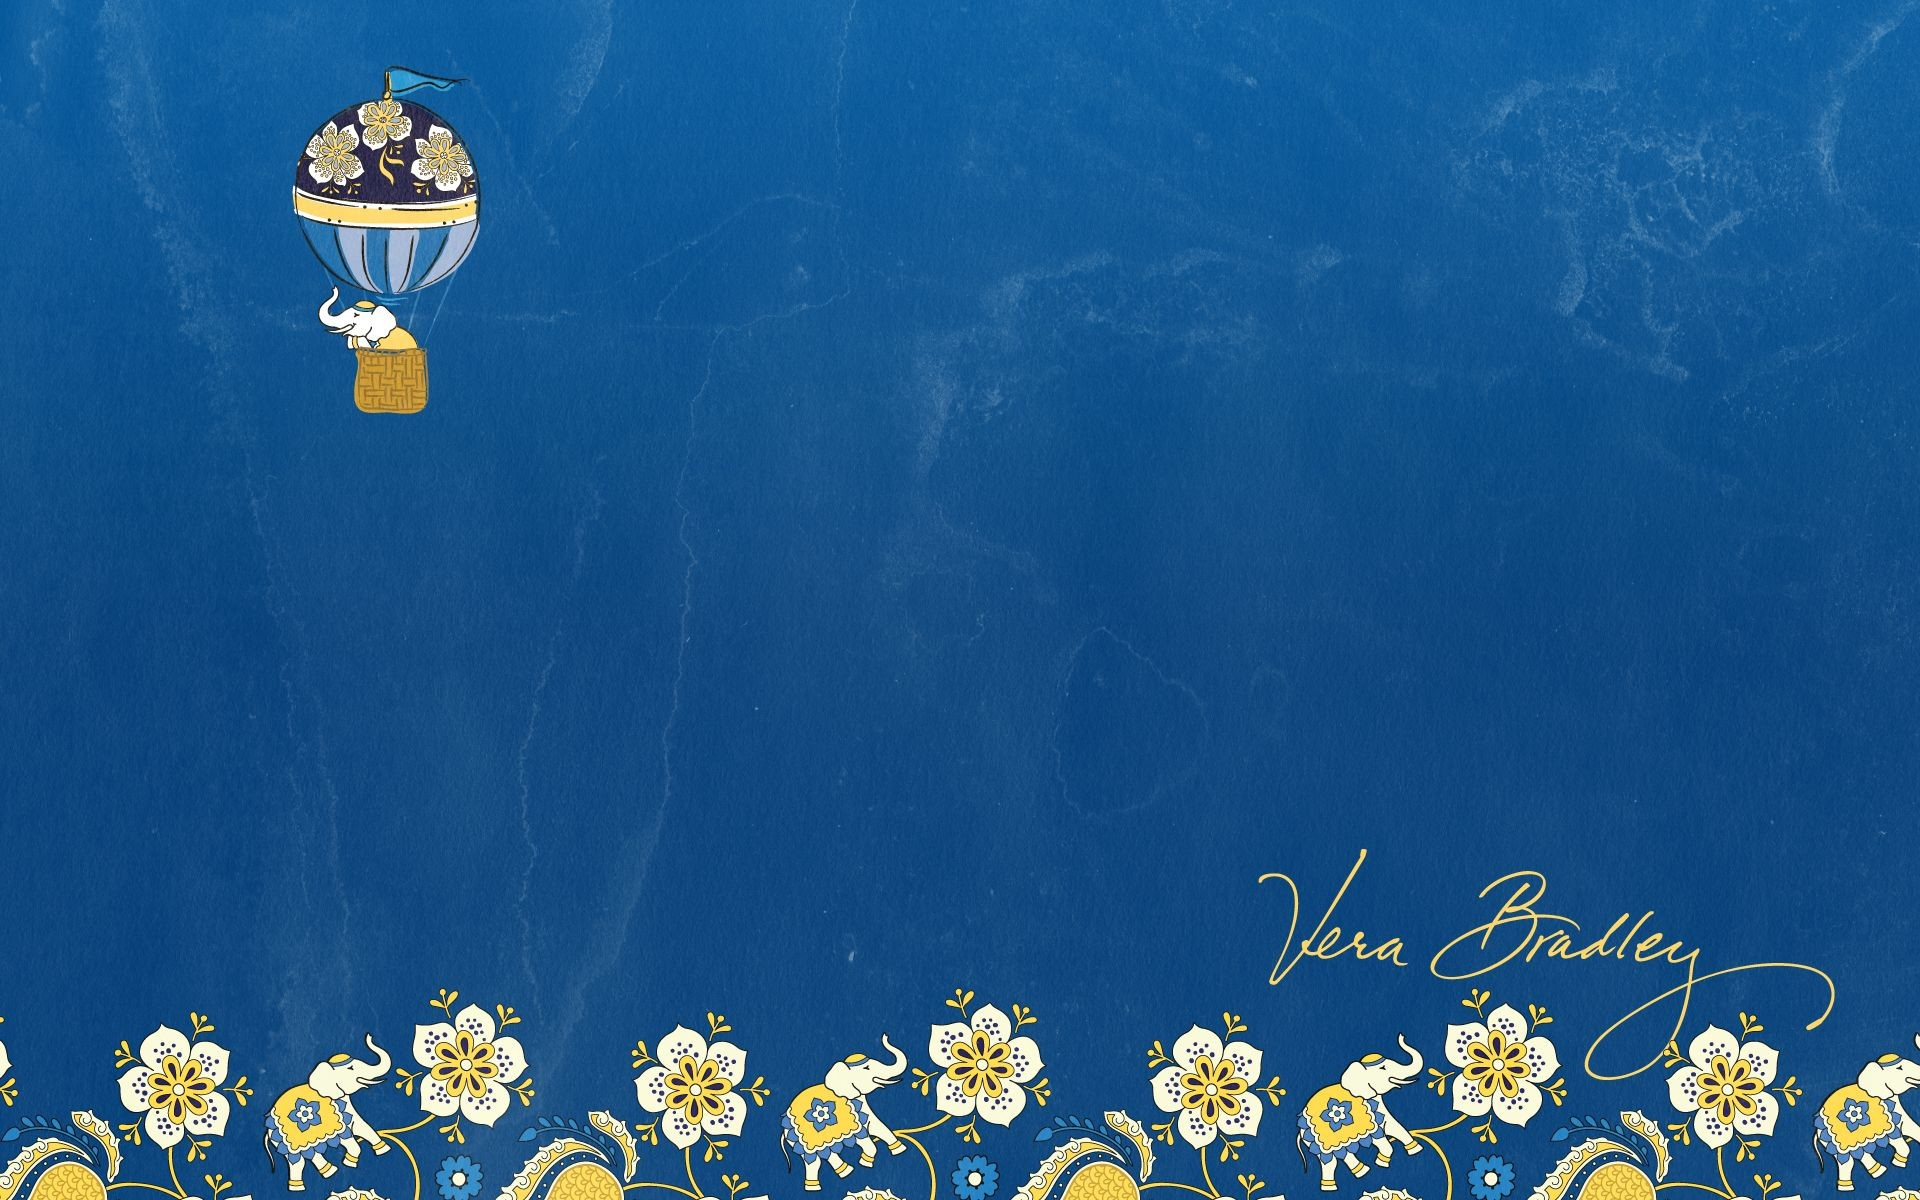 Vera Bradley Desktop Wallpaper in Ellie Blue